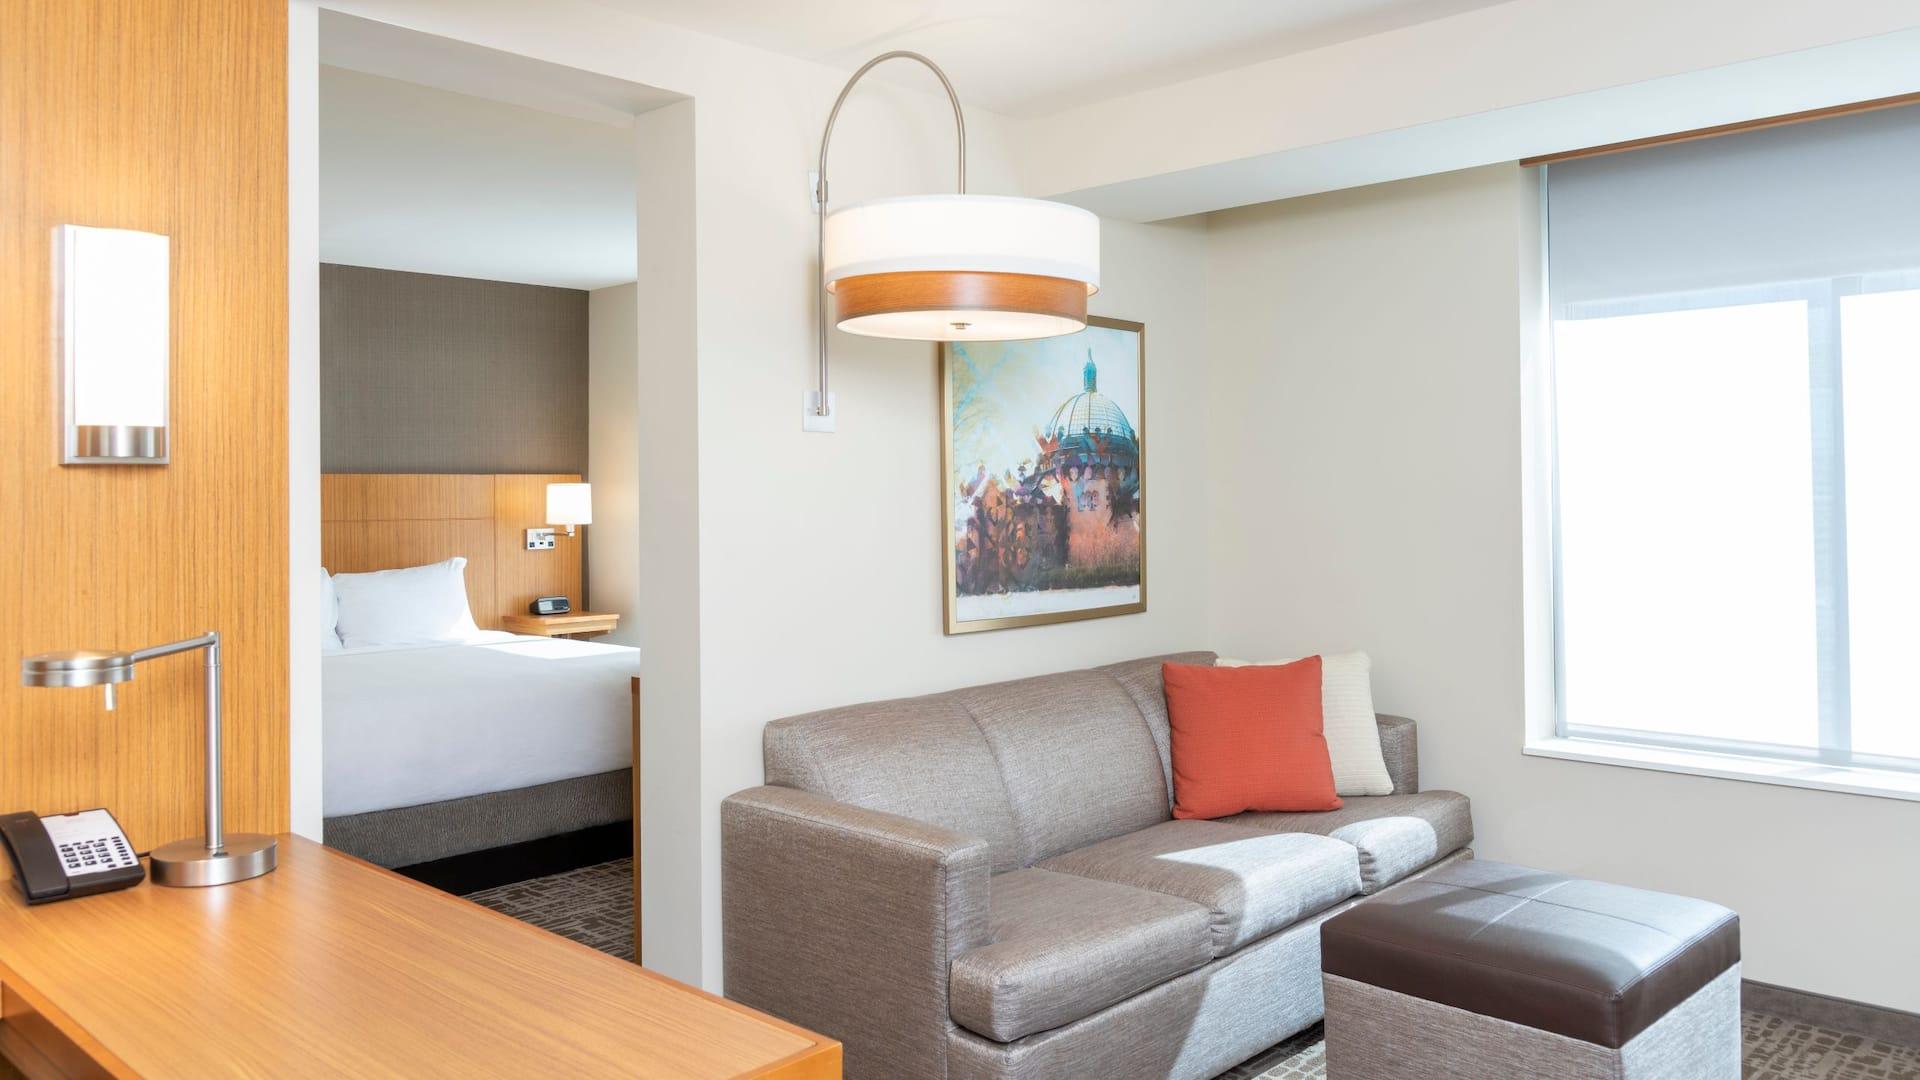 Royal Oak, Michigan Hotel room